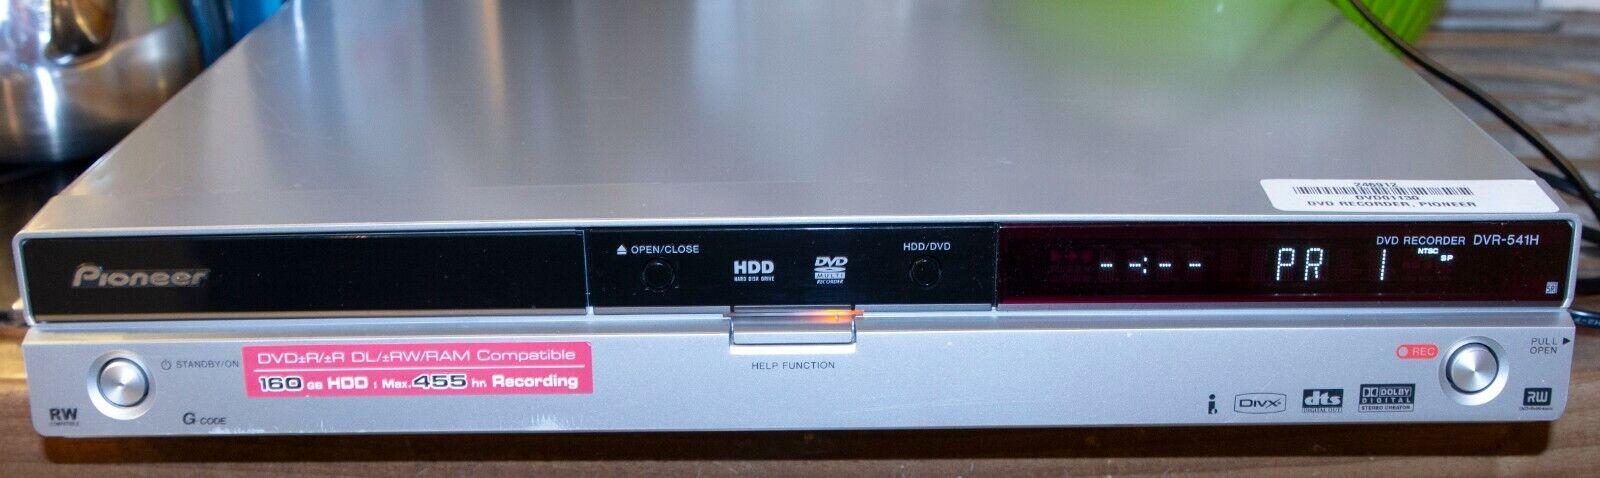 Pioneeer DVR-541H Festplatten Recorder VDV Play DIVX DVB-C DVD Recorder